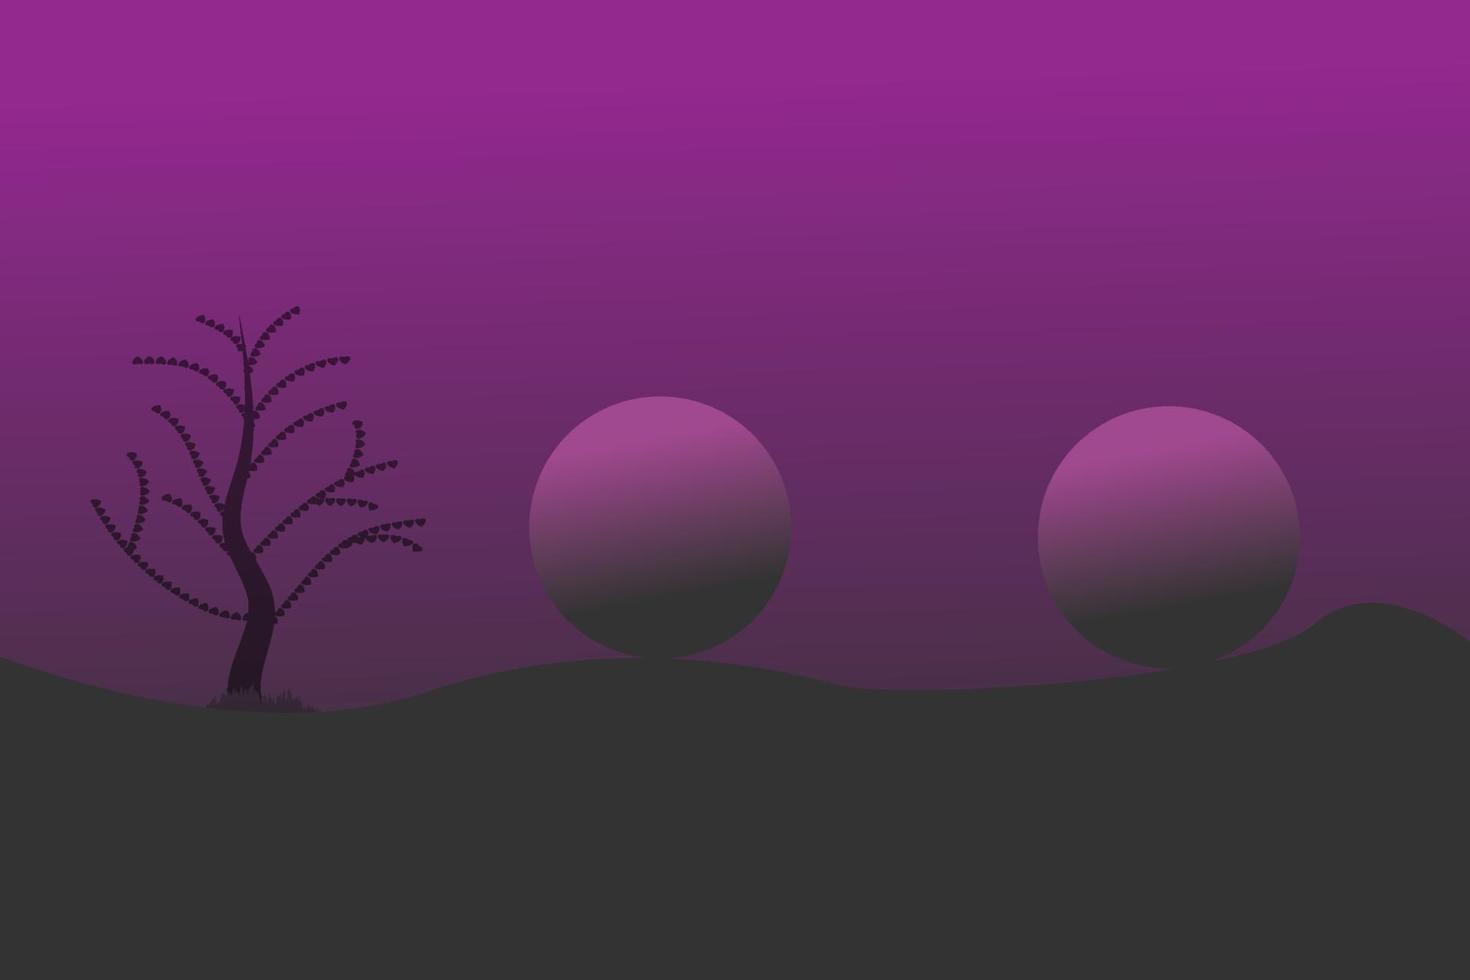 nattvy lila bakgrund abstrakt vektor design